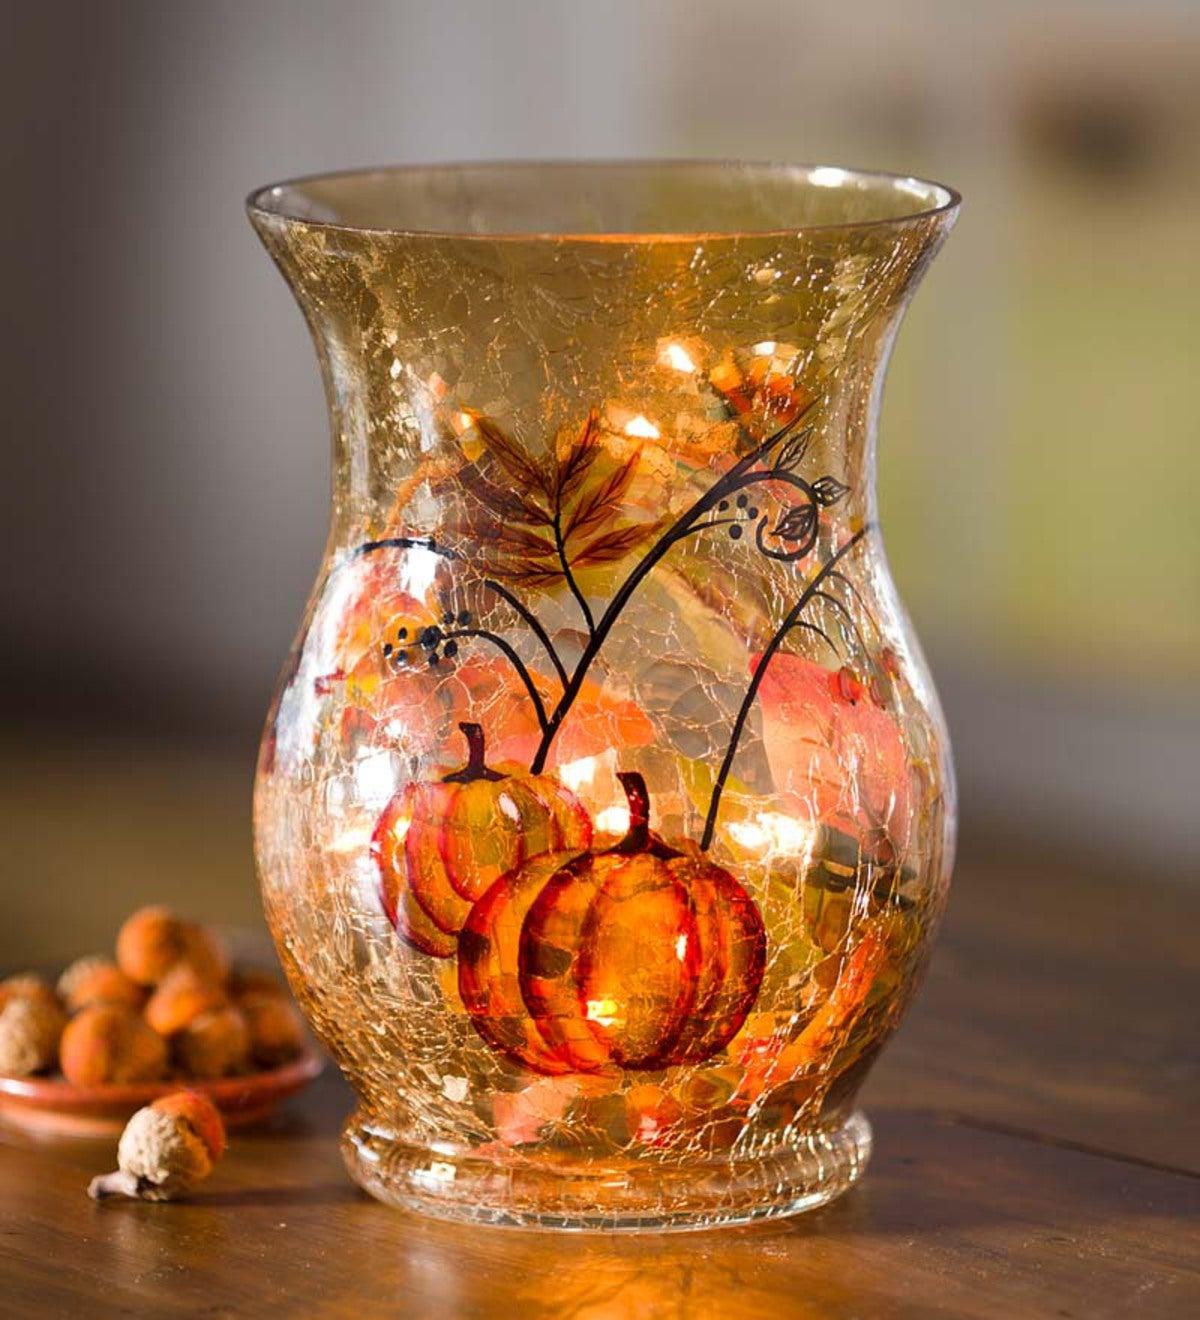 Le Glass Lighted Hurricane Lamp, Decorative Glass Hurricane Lamps